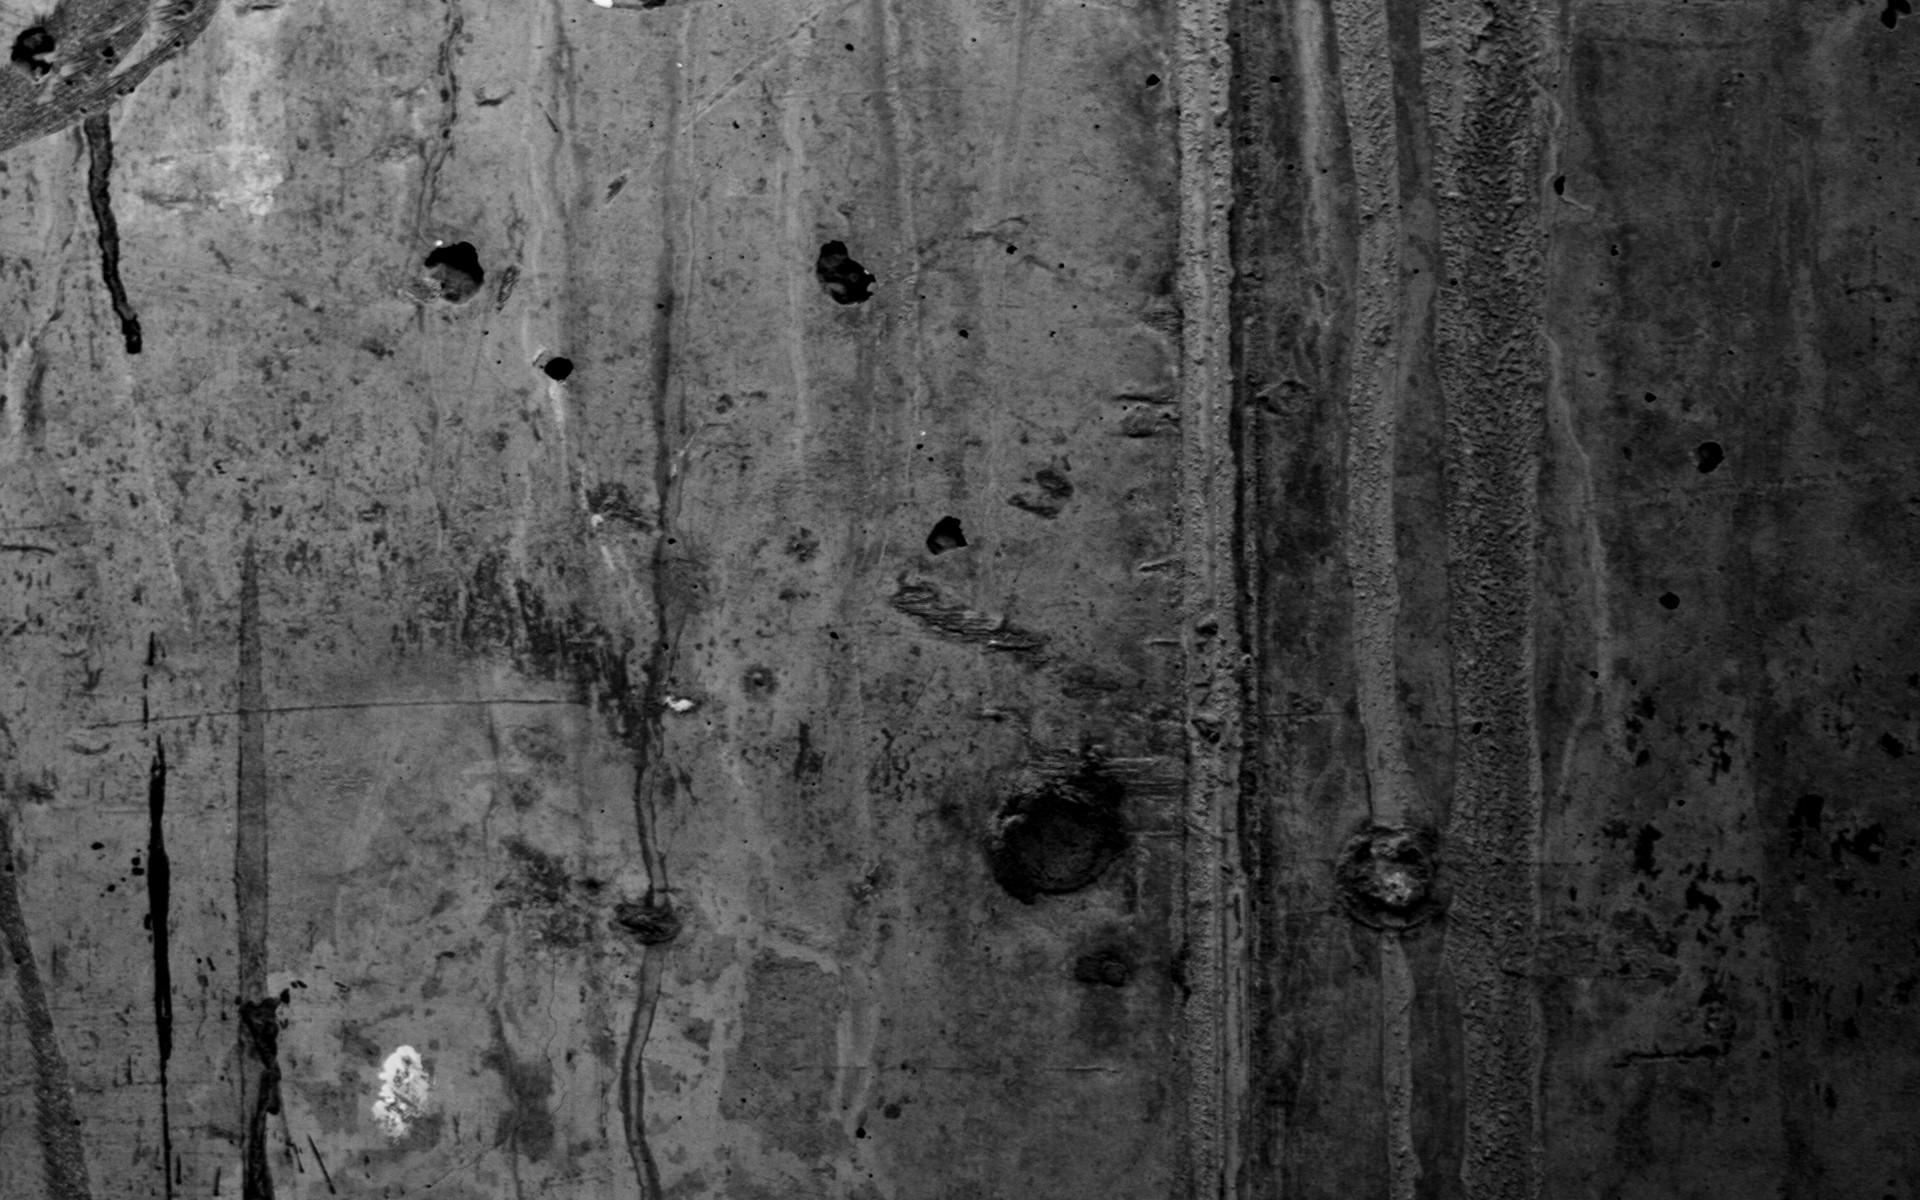 breathtaking-hd-gray-wood-background-backgrounds – Headless Horseman .